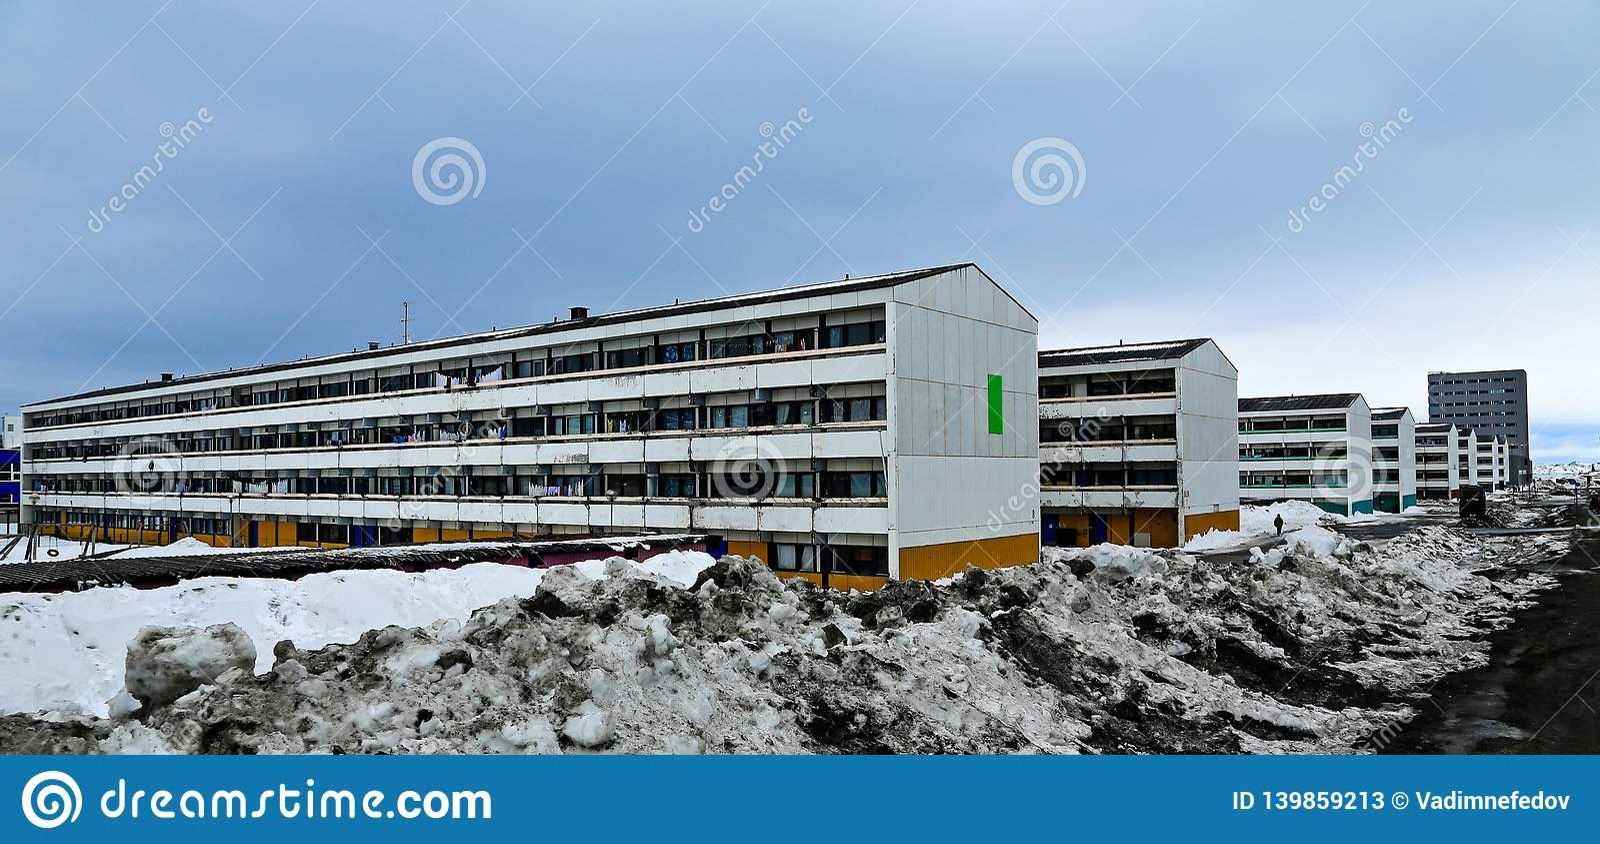 Dull rows of long Inuit living buildings in Arctic capital Nuuk